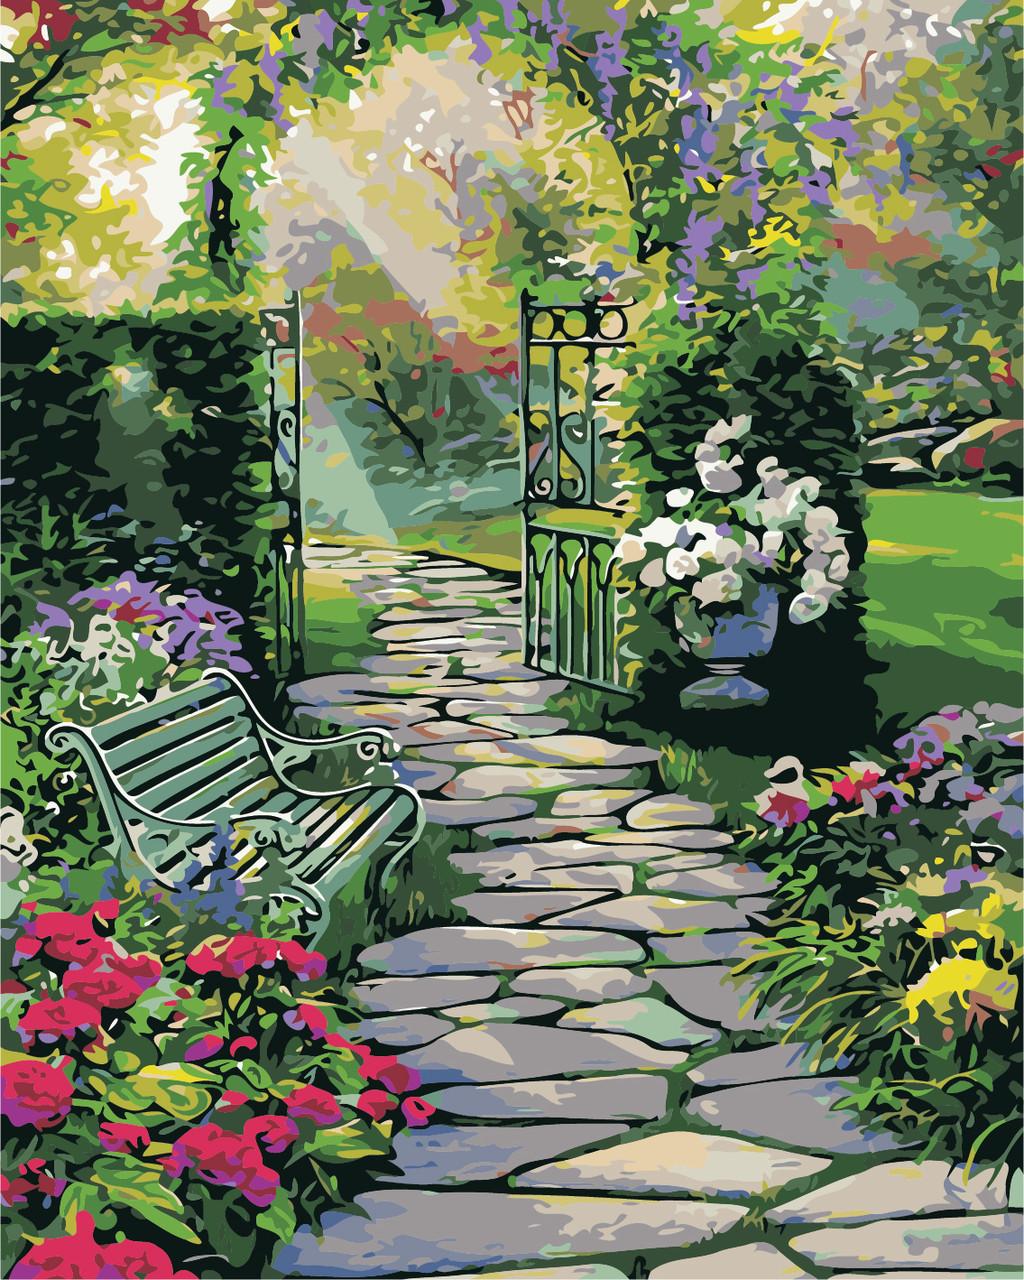 Картина по номерам Волшебный сад 40 х 50 см (AS0382)